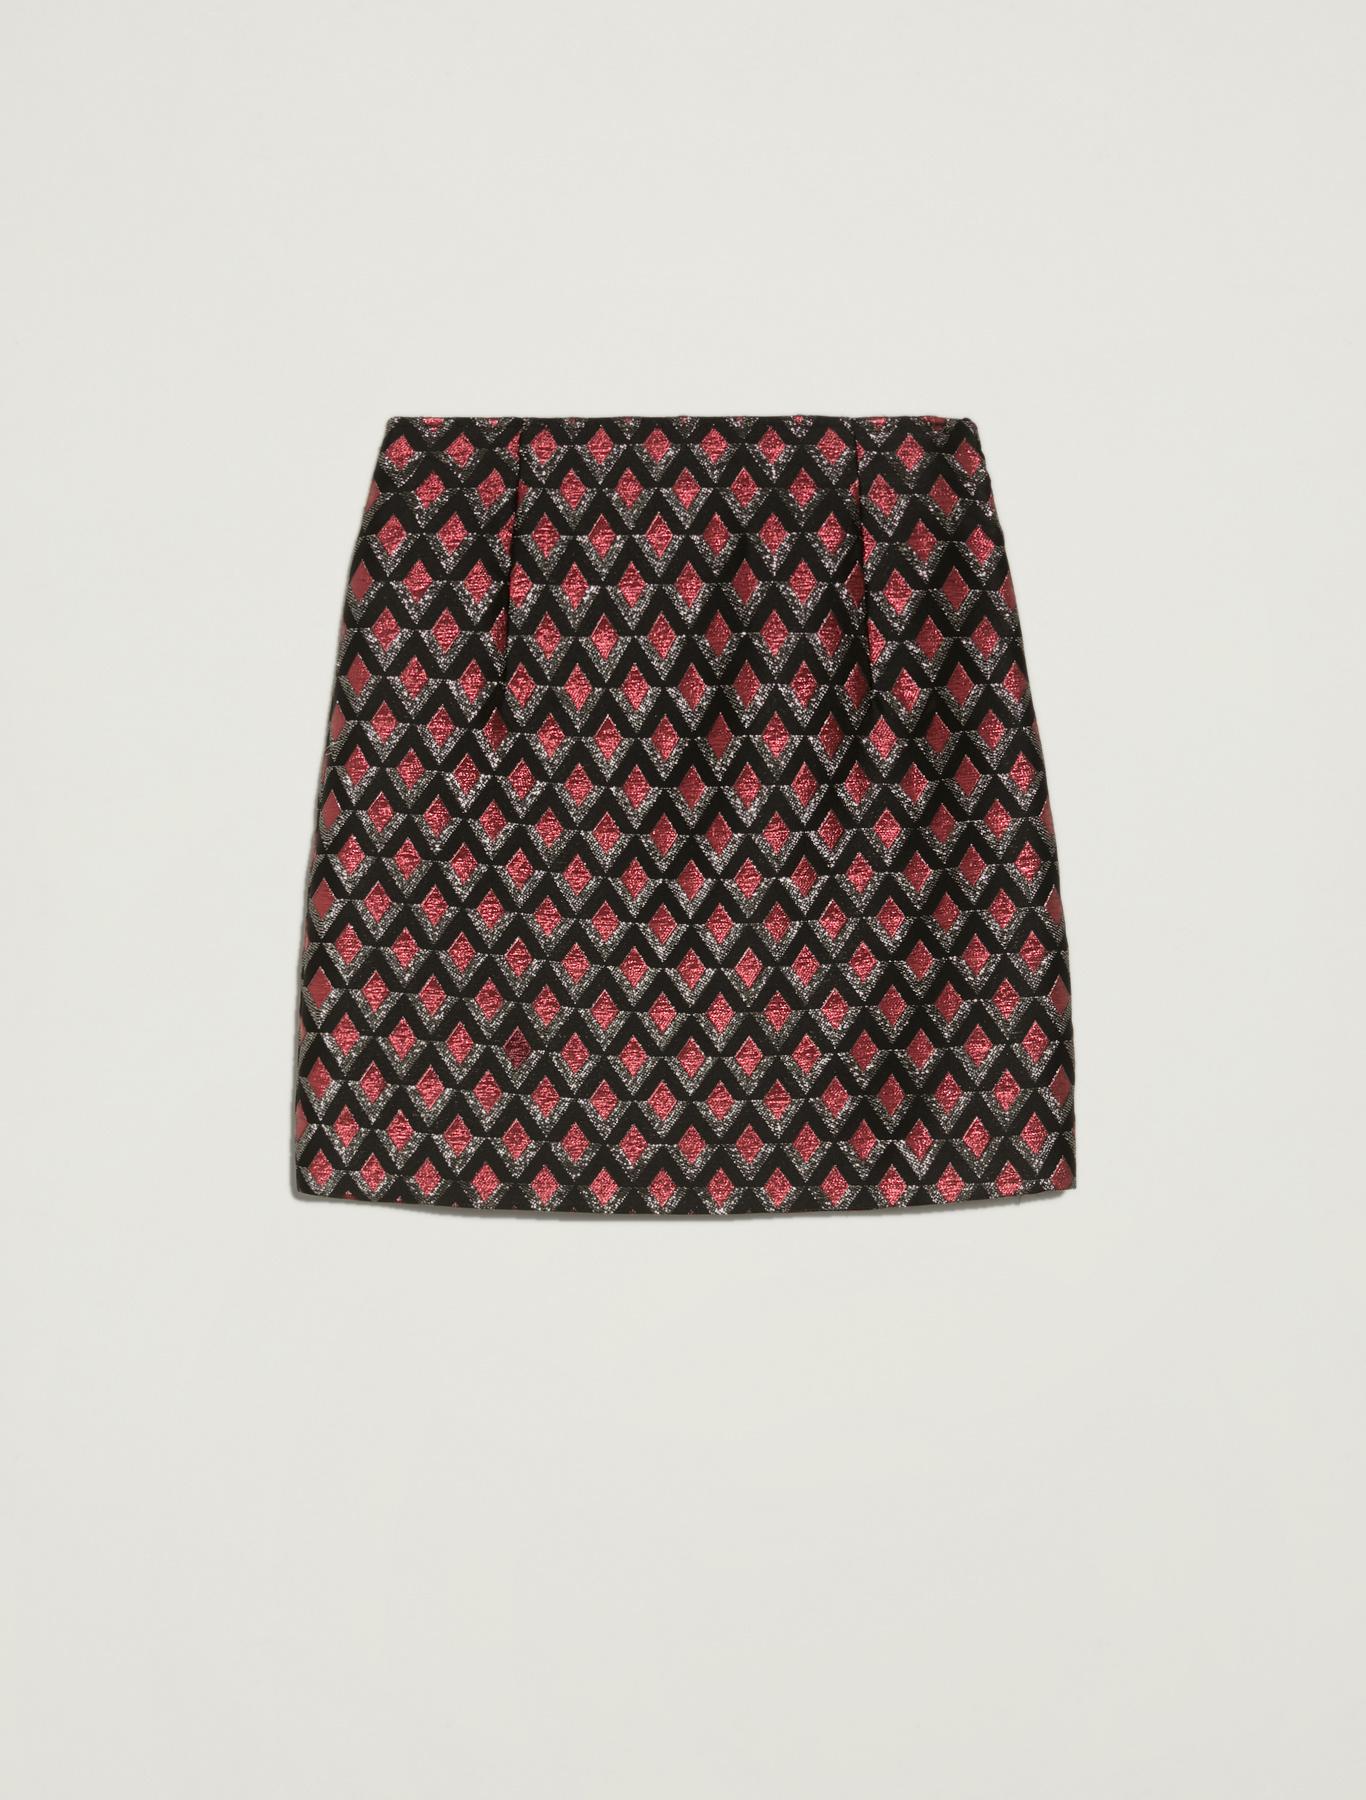 Lamé jacquard skirt - burgundy pattern - pennyblack